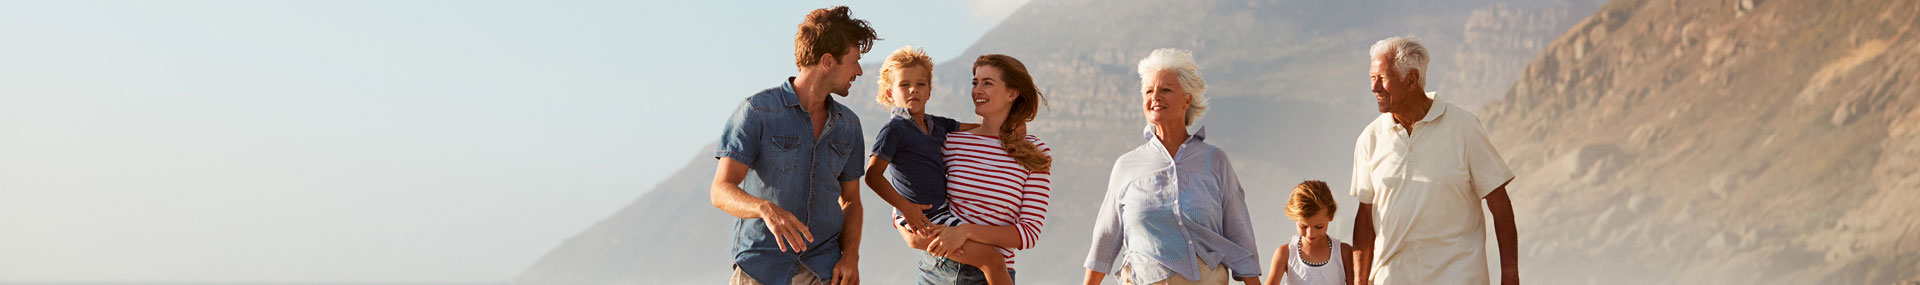 Multi-generational family walking outdoors.